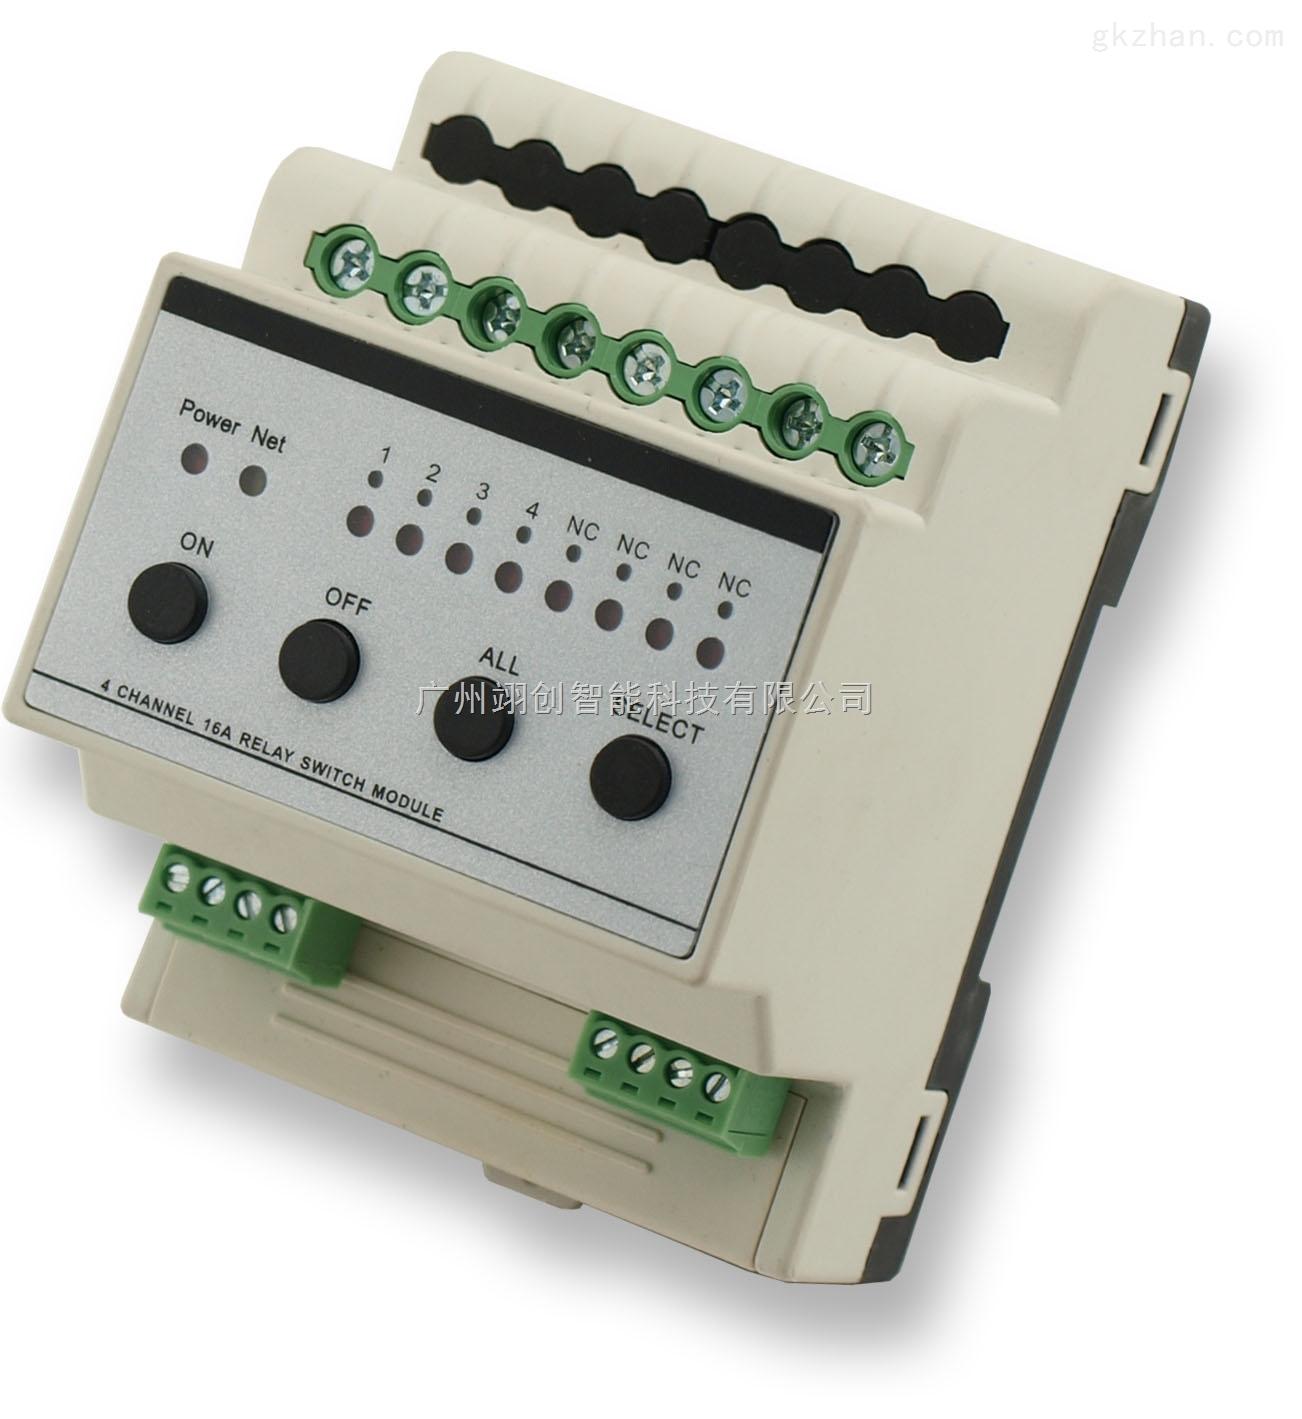 et-r0416a-4路智能照明模块16a继电器开关器控制系统